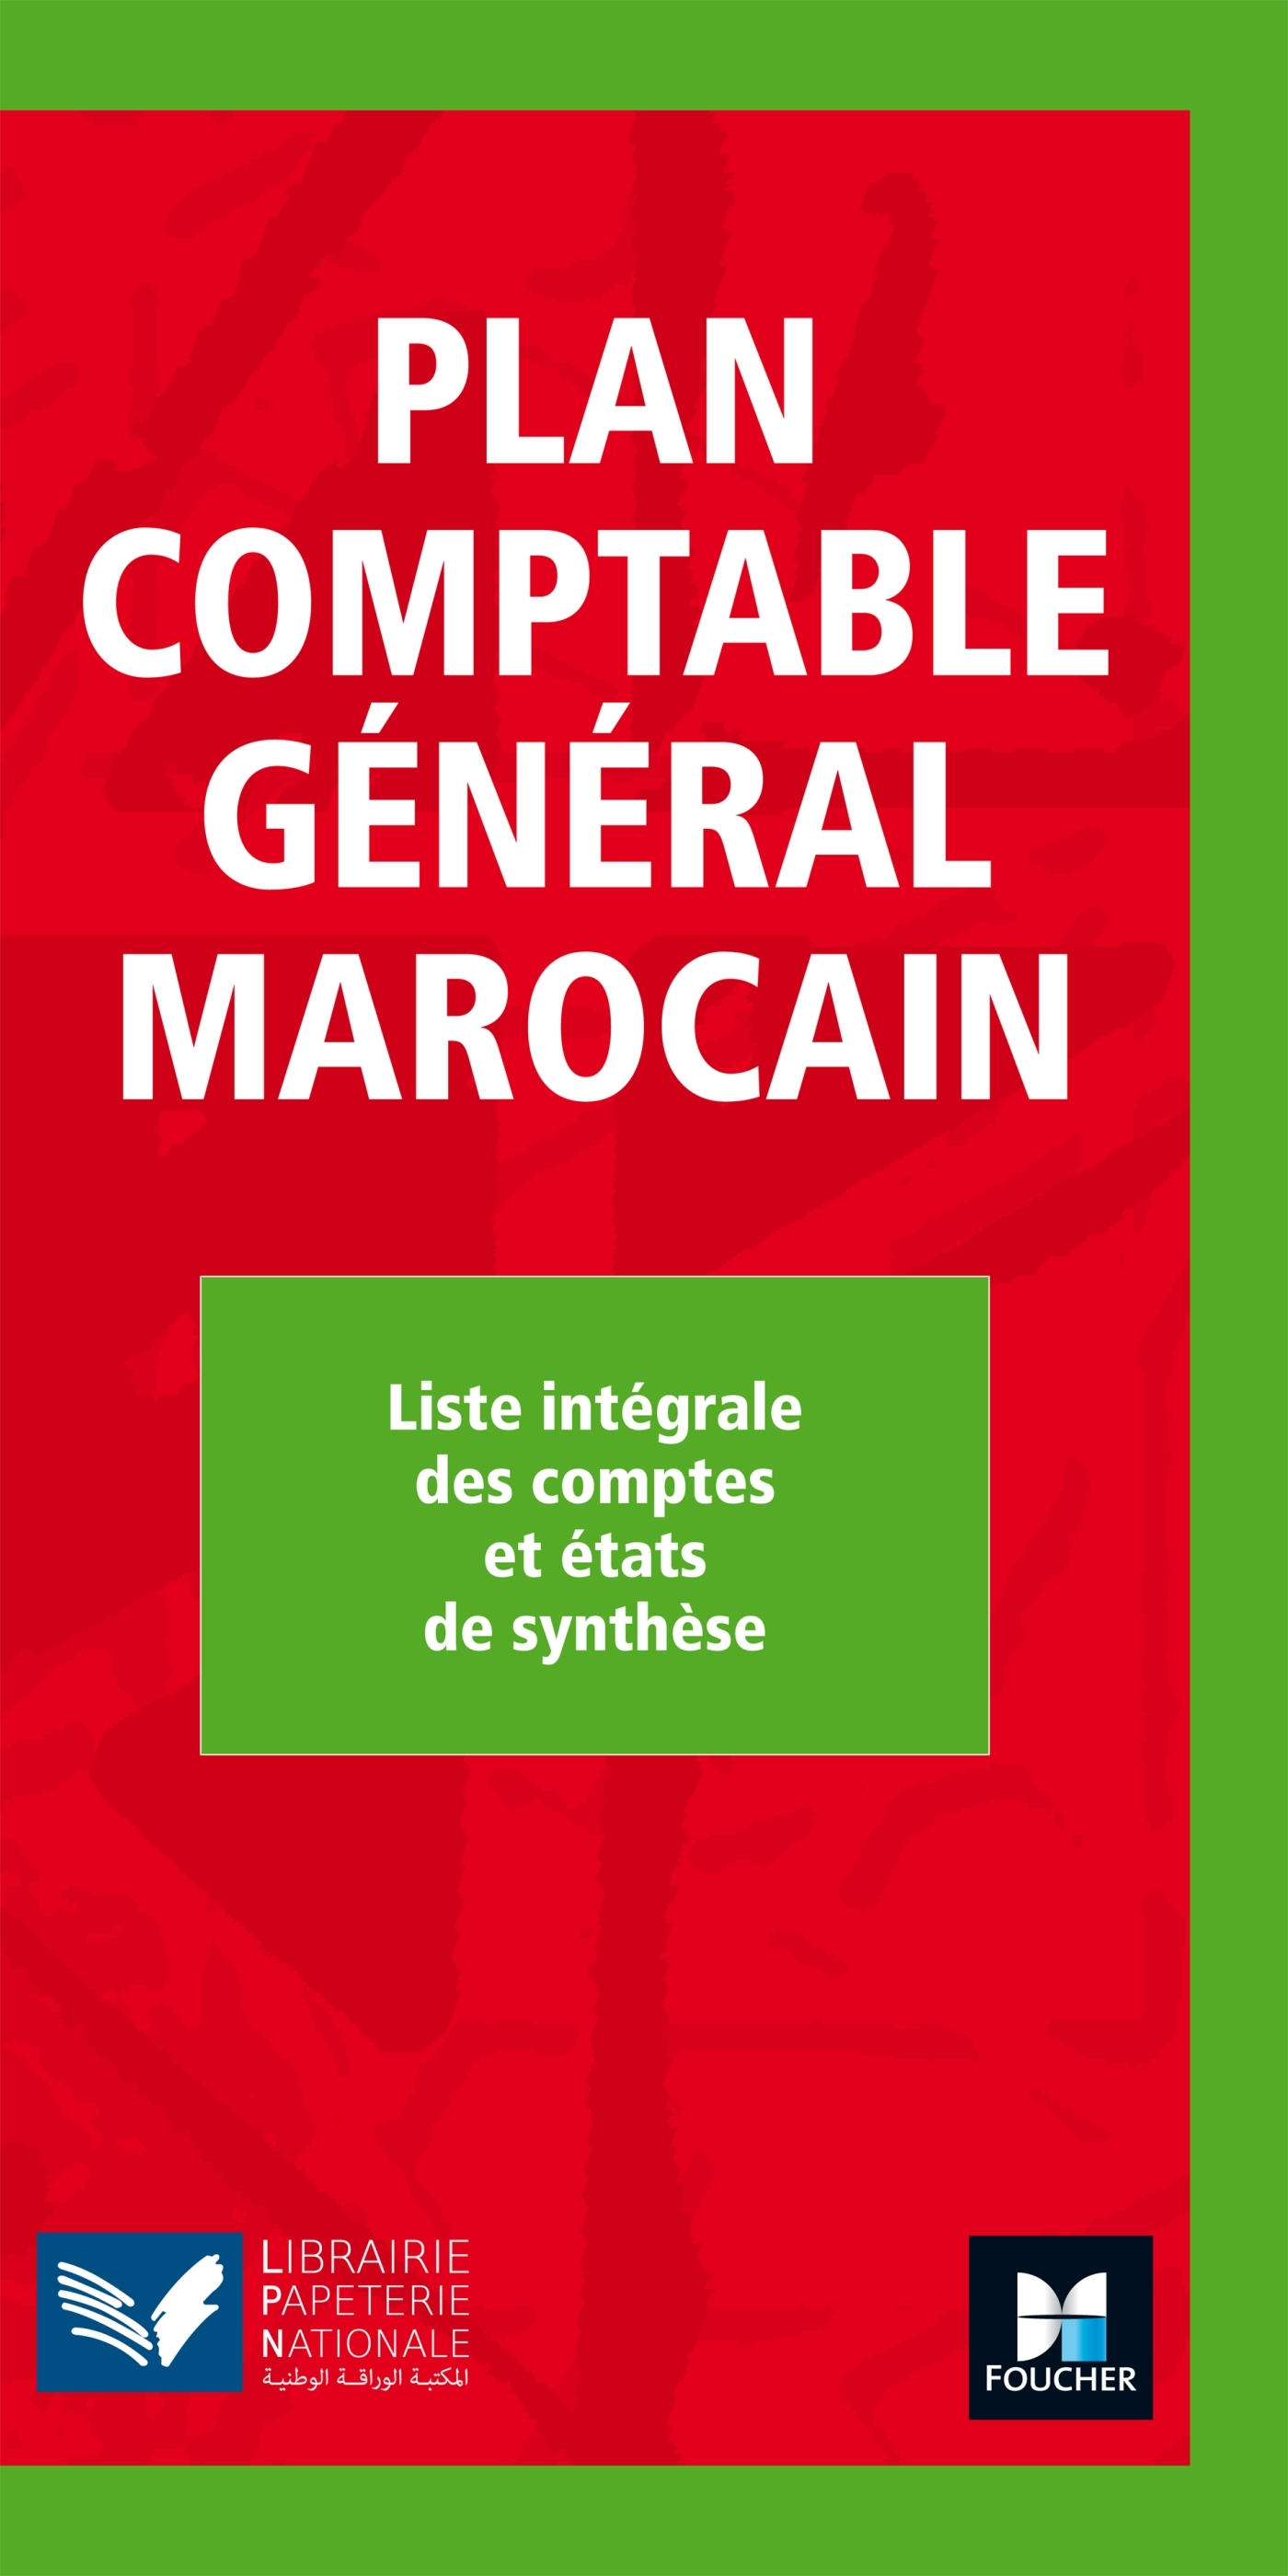 PLAN COMPTABLE GENERAL MAROCAIN QUADRI N.E